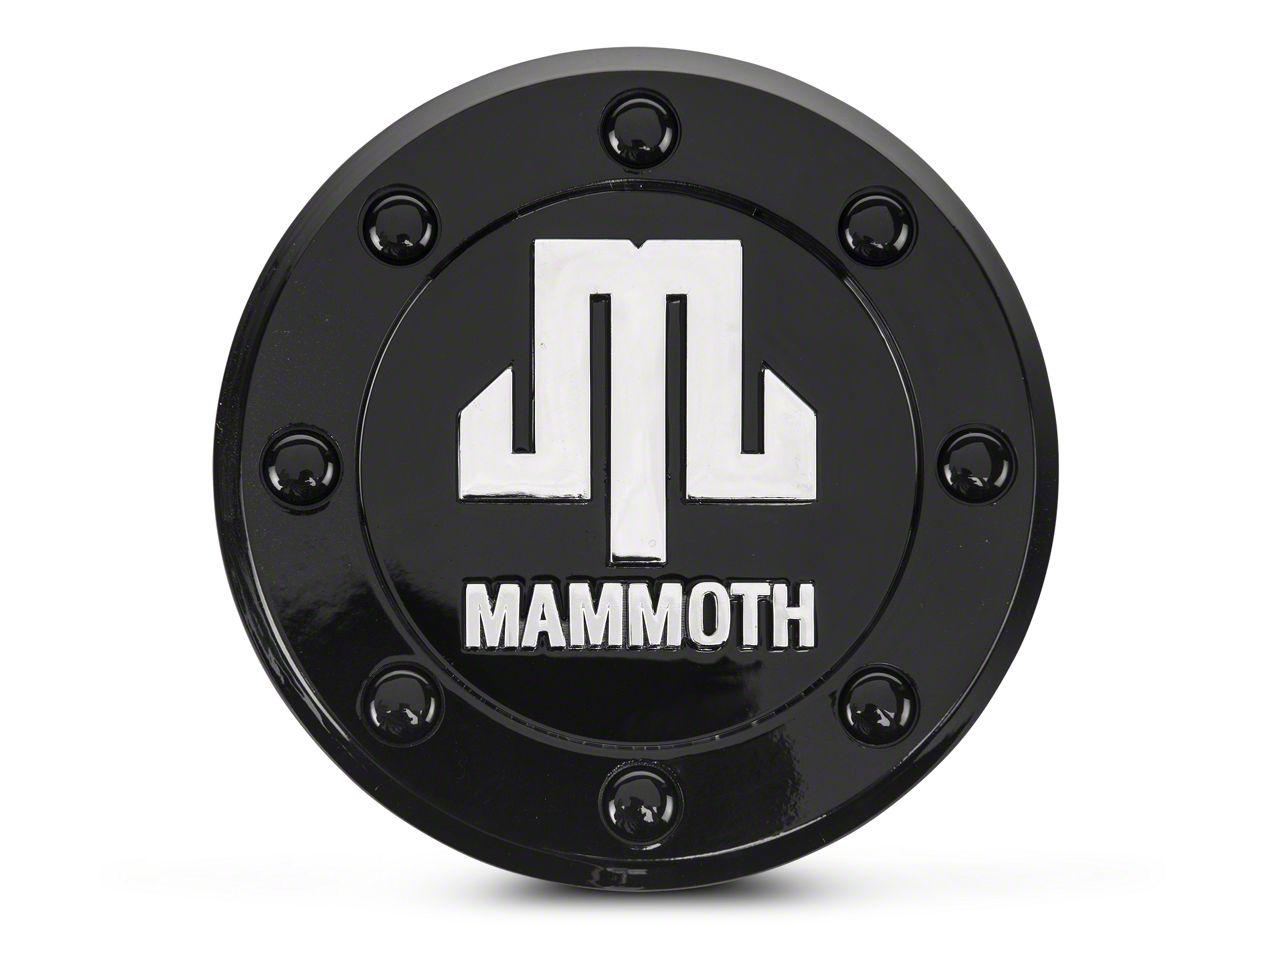 Mammoth 8 Center Cap (87-06 Jeep Wrangler YJ & TJ)